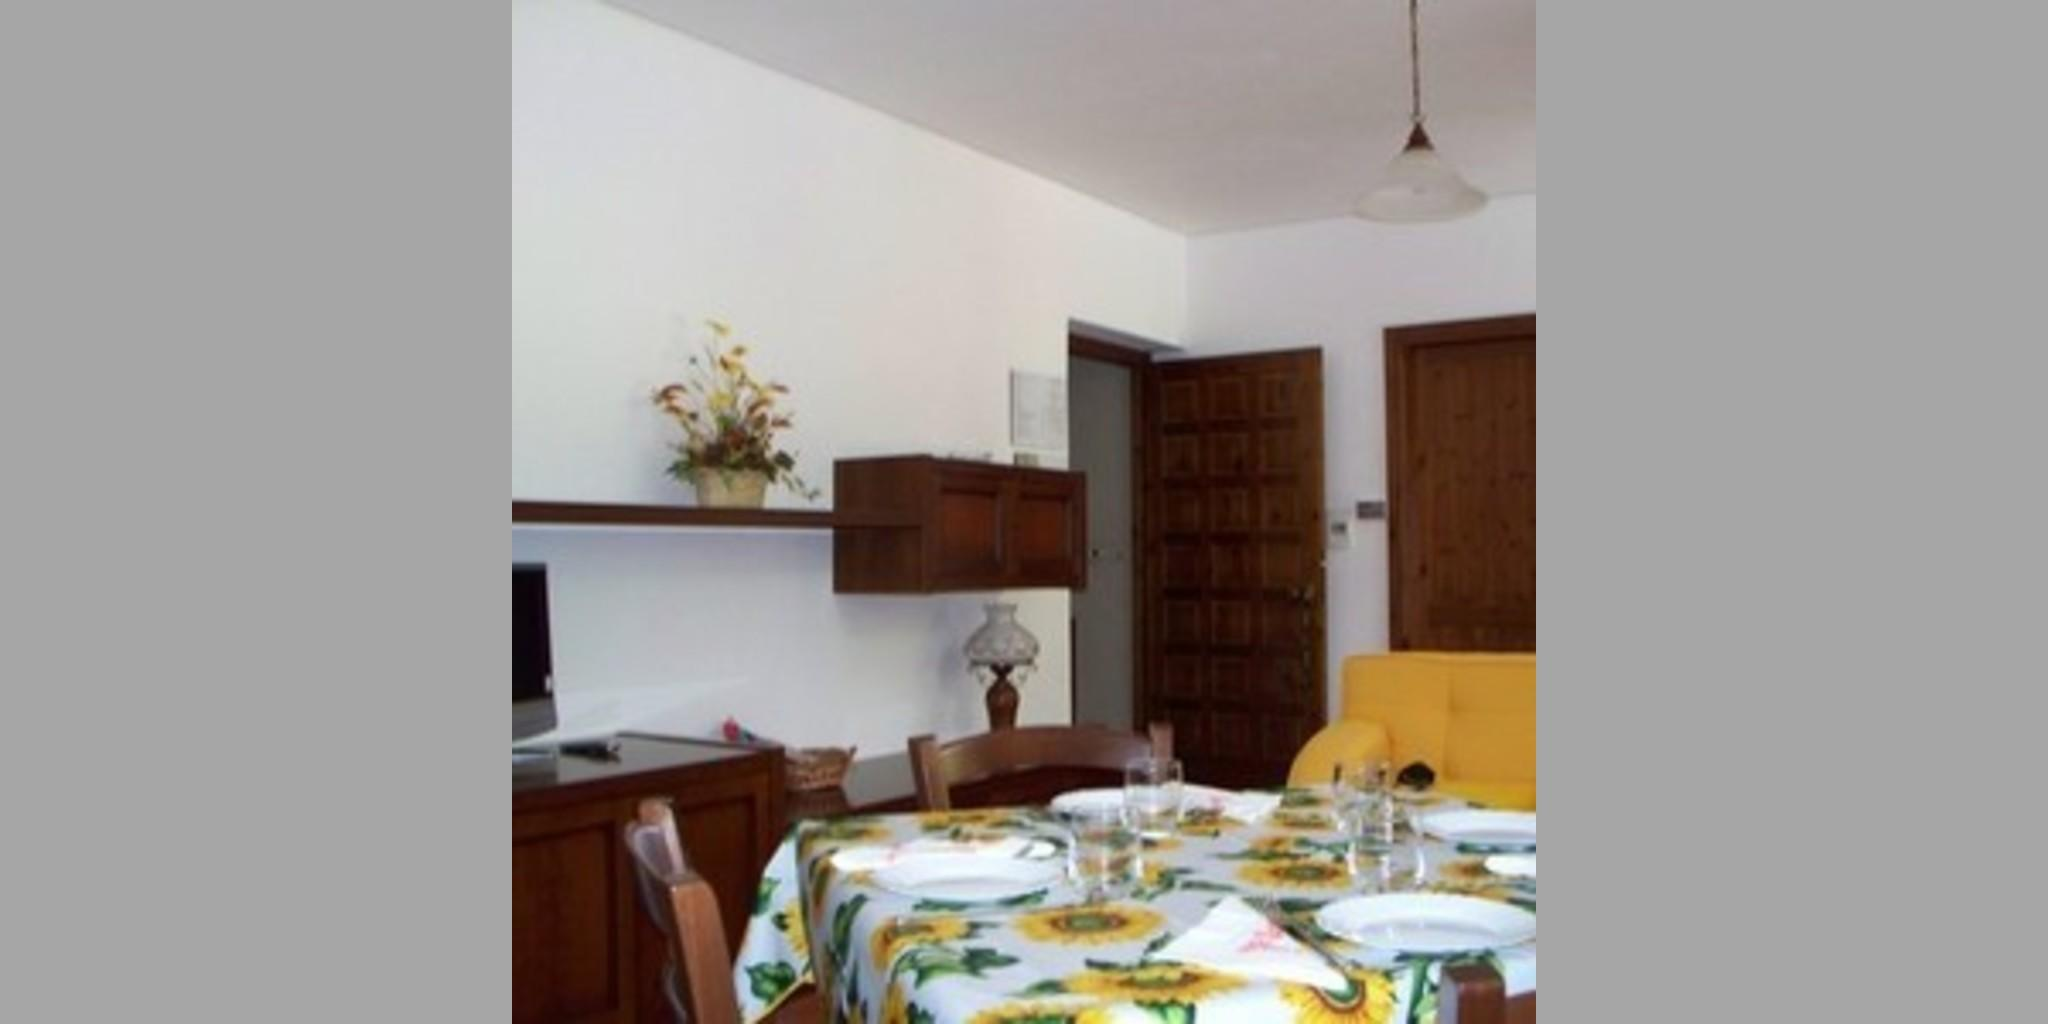 Appartamento Villar Pellice - Val Pellice